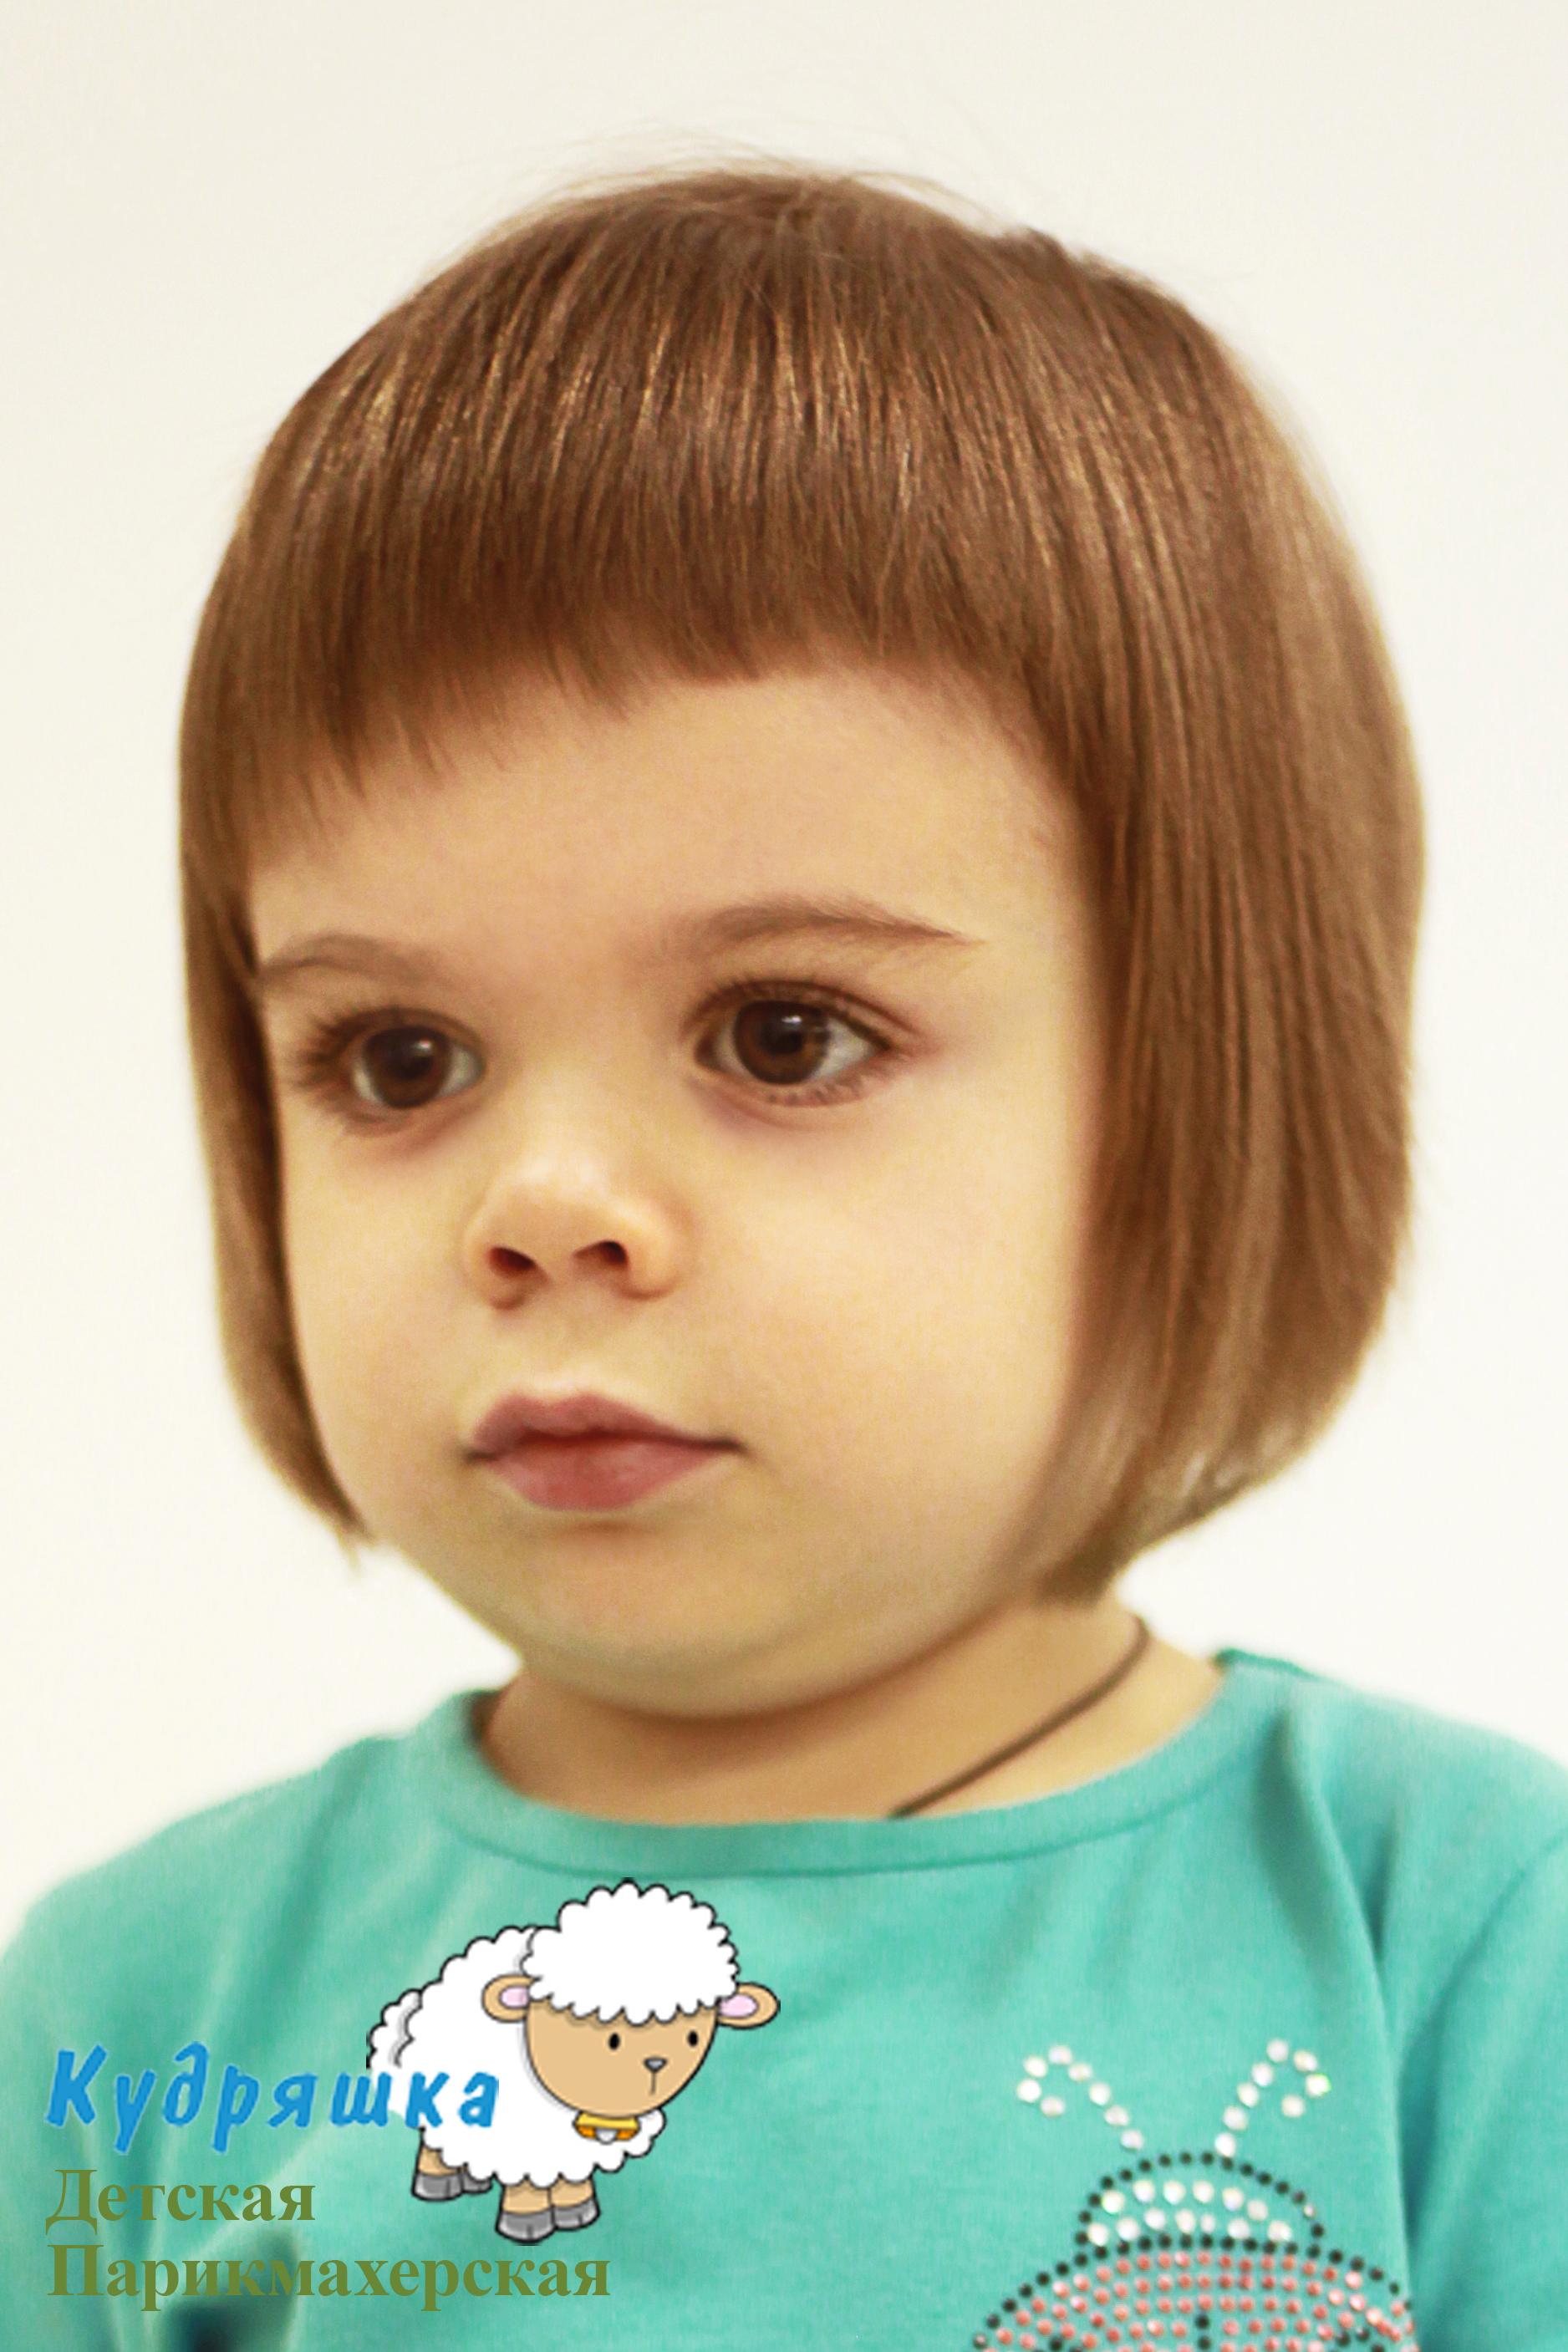 Стрижка ребенка 2 года девочке